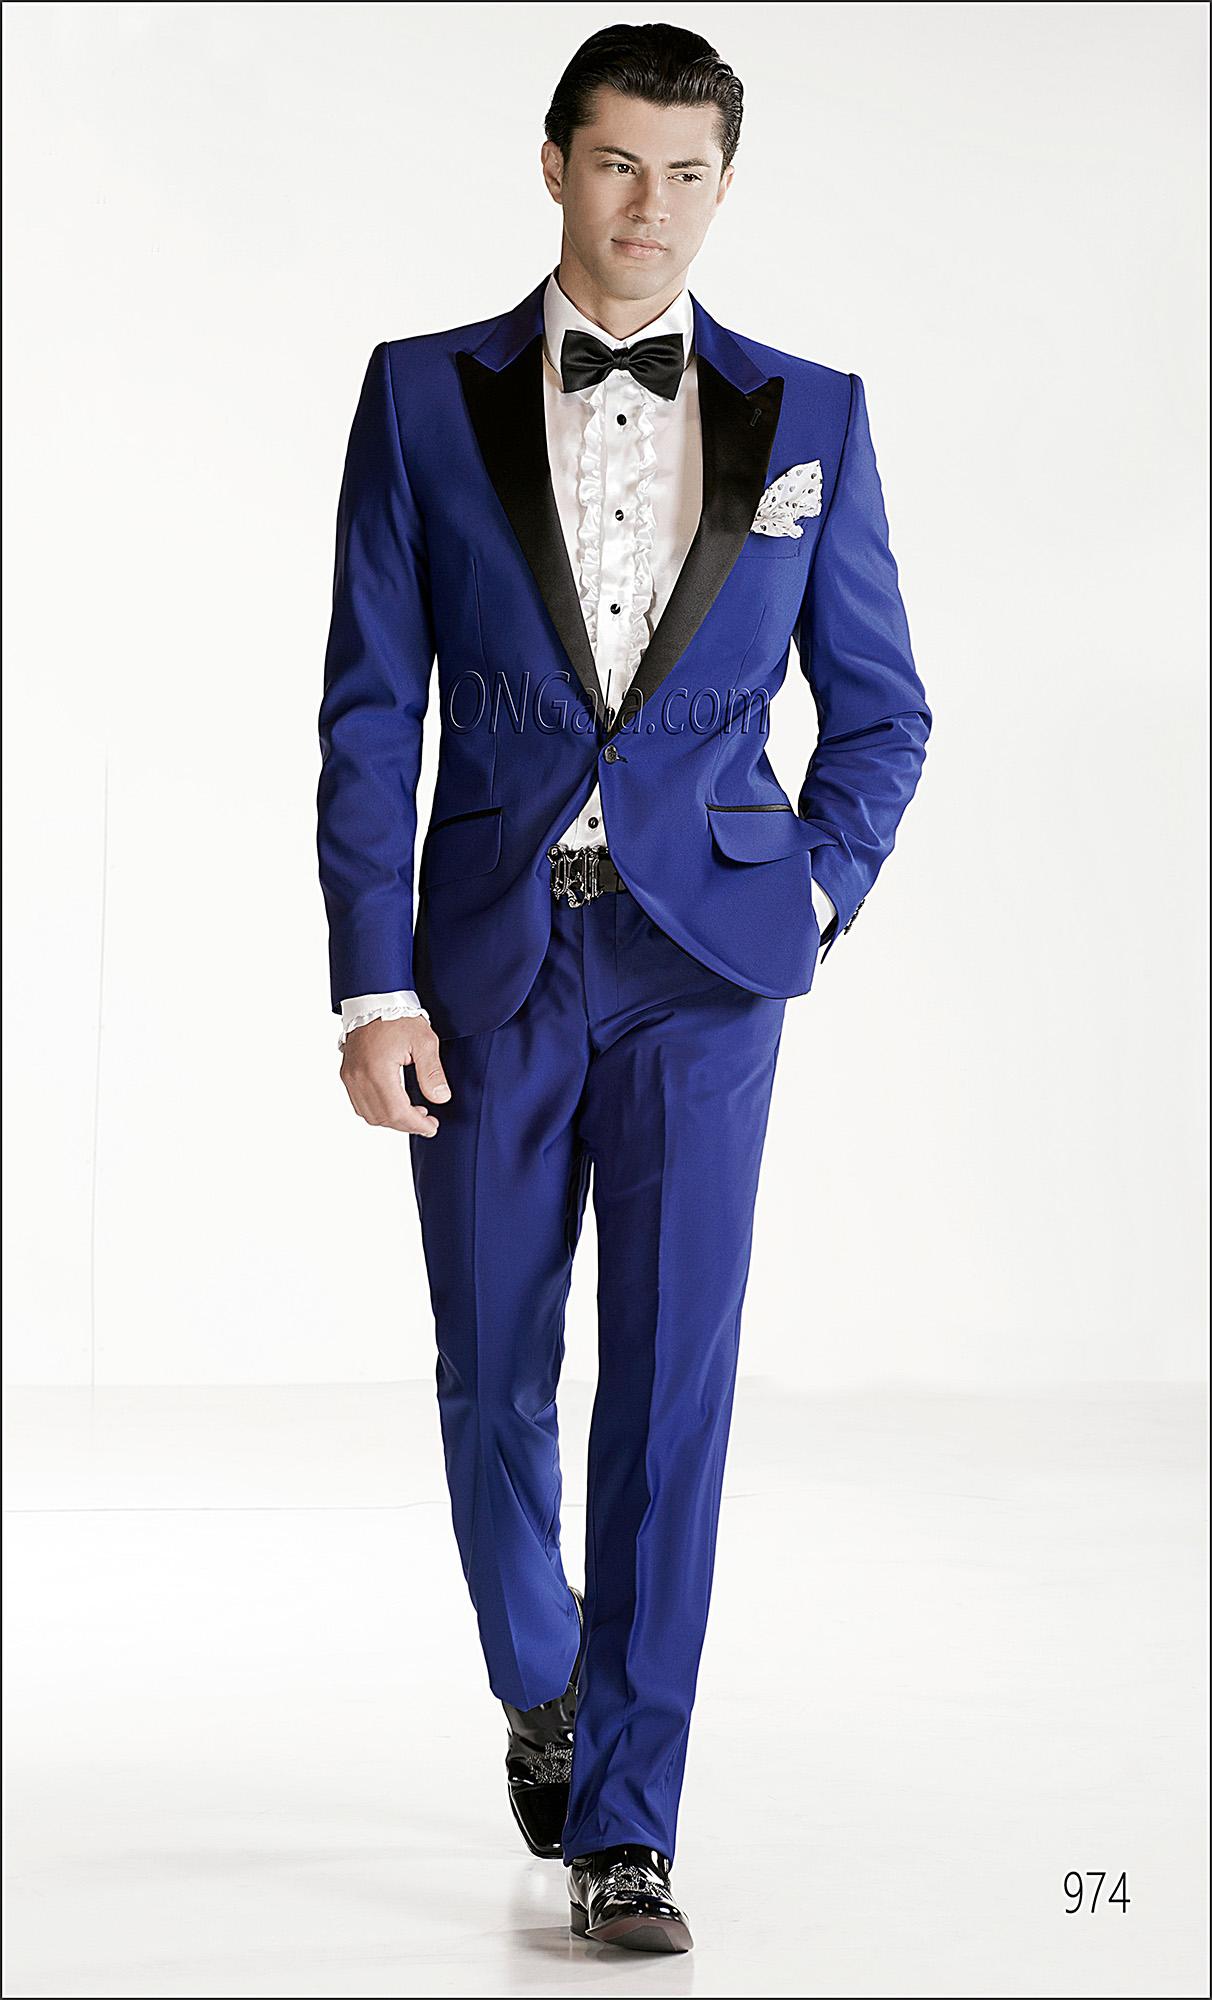 Vestito blu cerimonia uomo